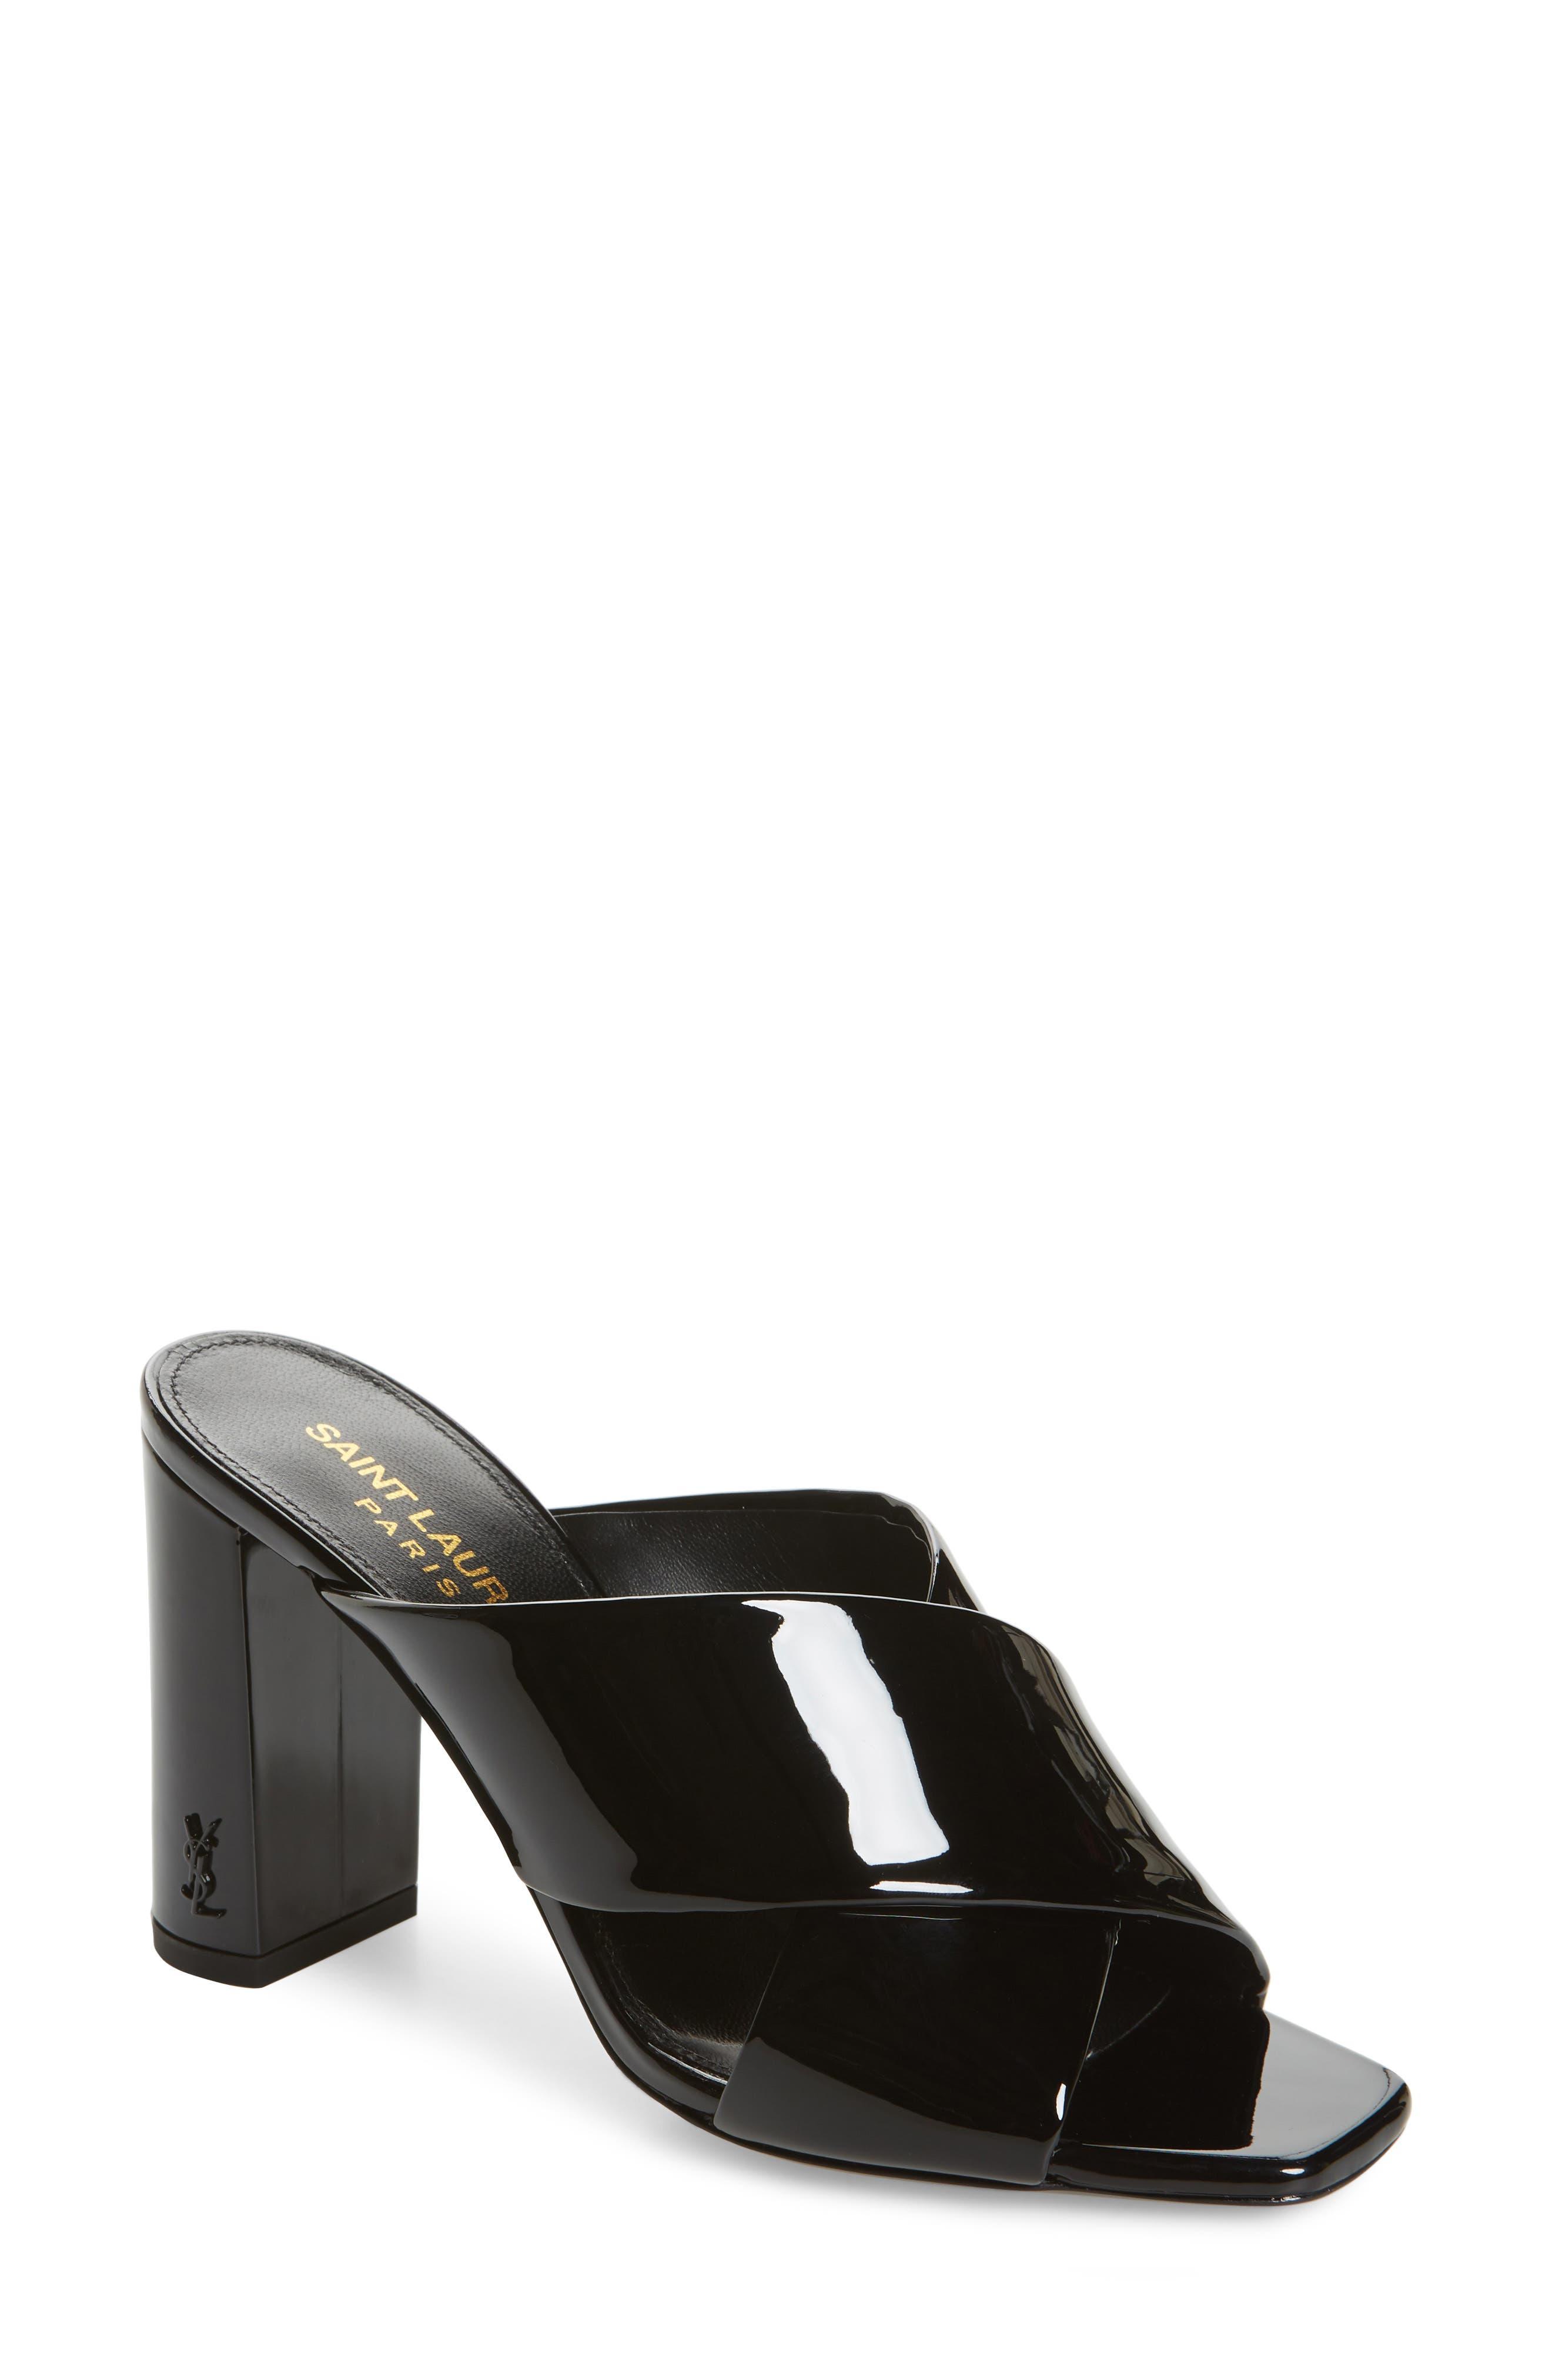 Loulou Slide Sandal,                         Main,                         color, BLACK PATENT